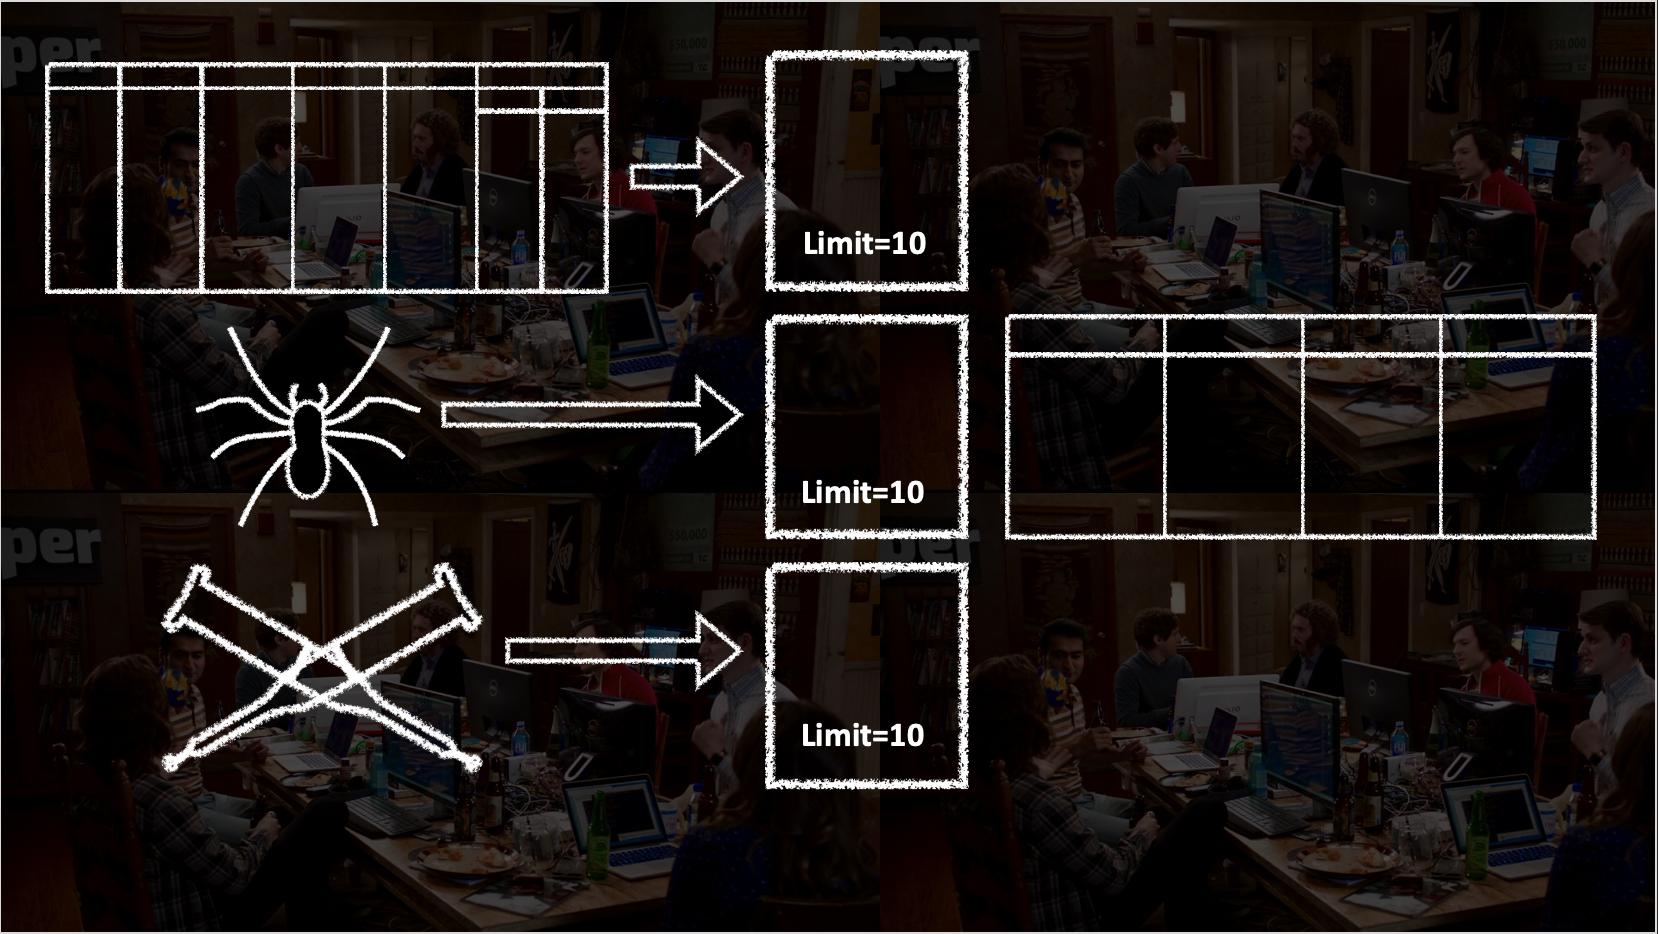 kanban method product development process